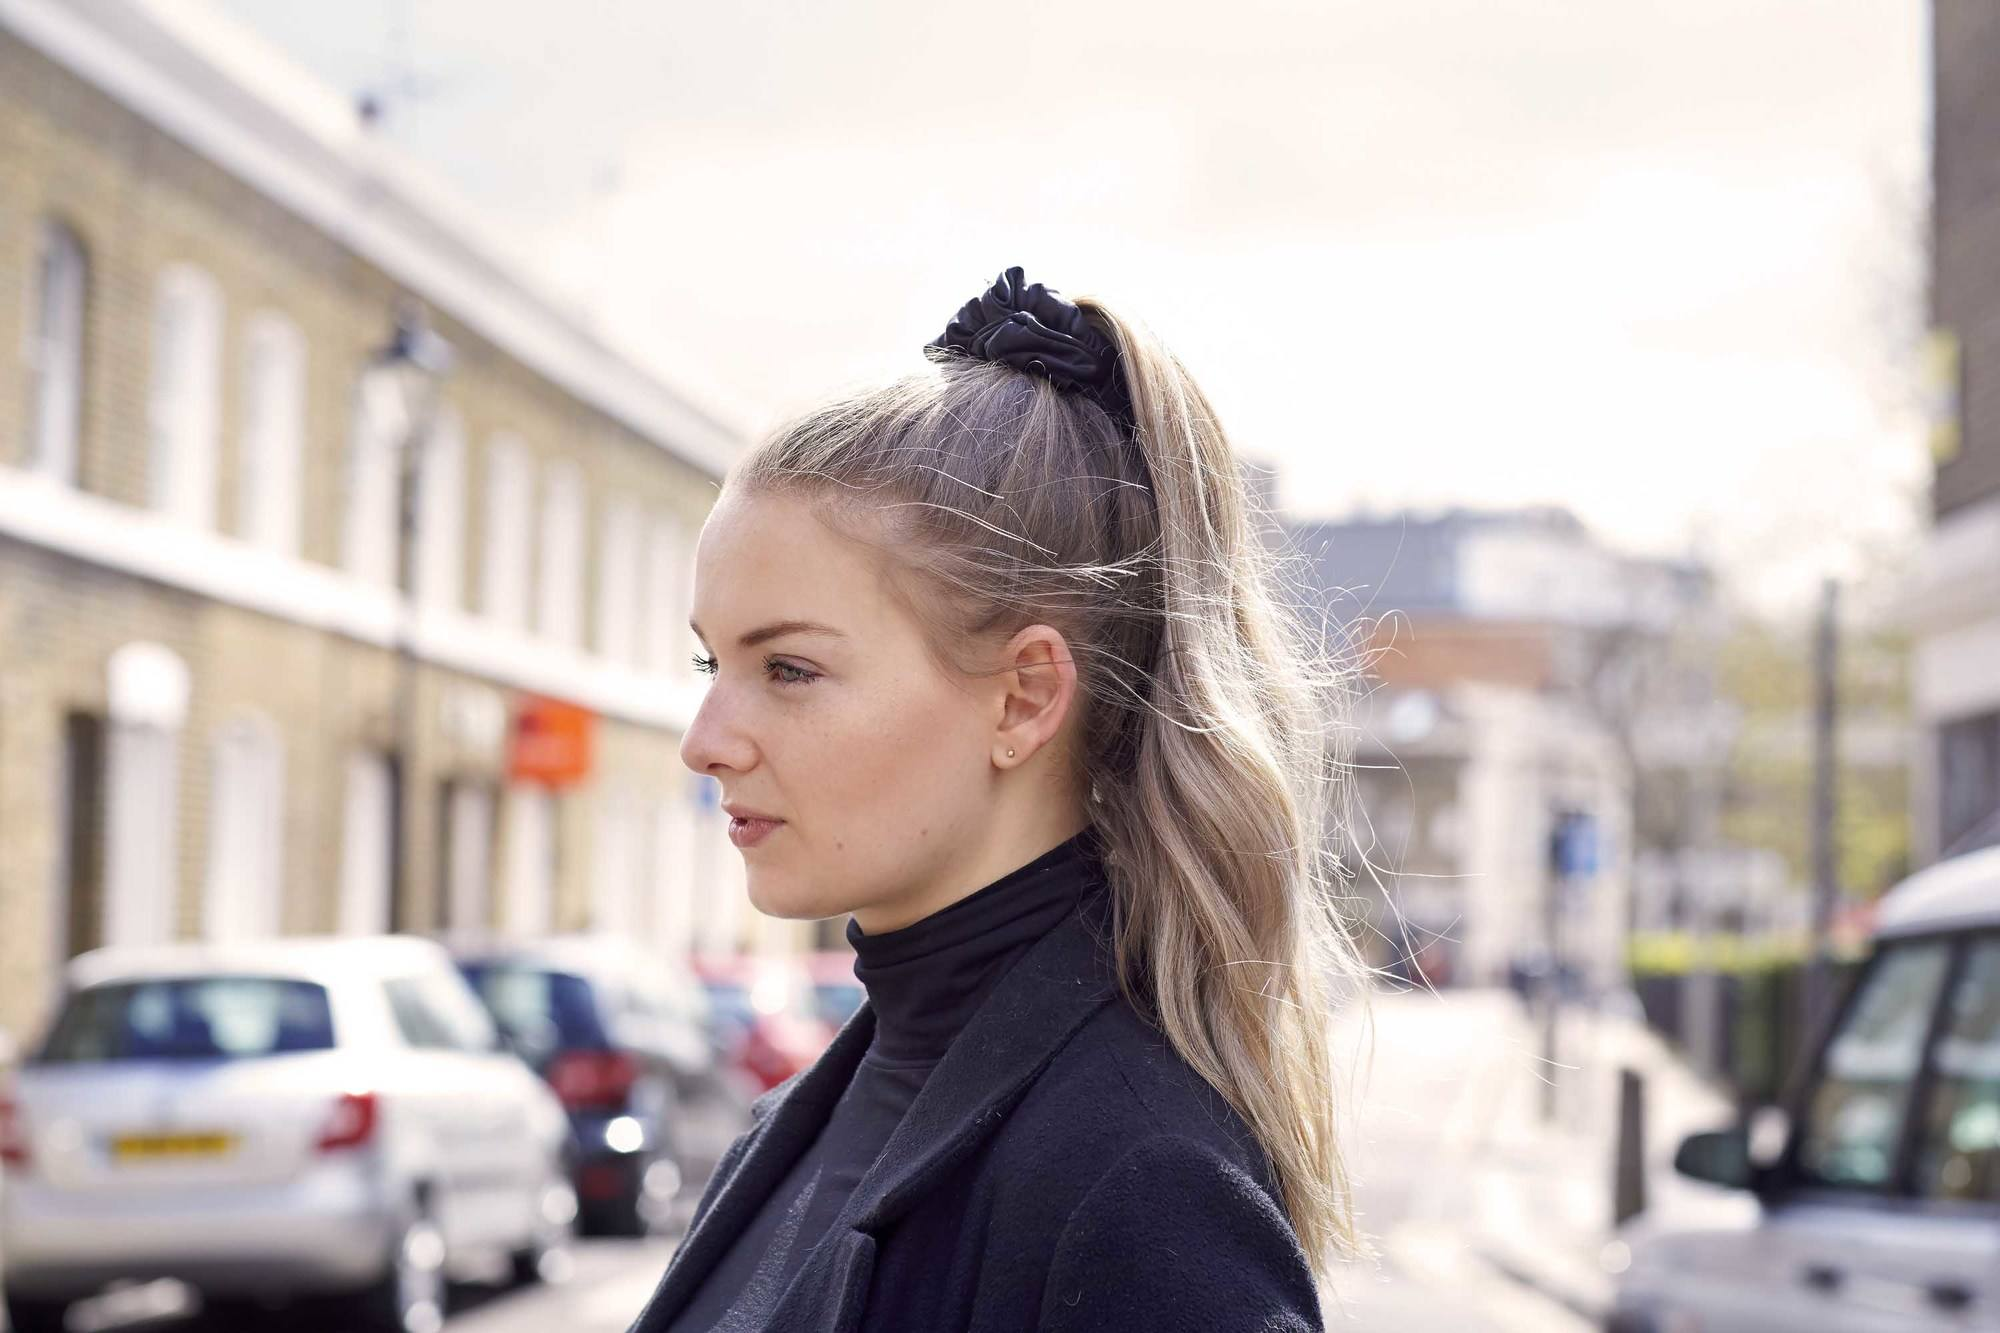 Wanita kaukasia dengan warna rambut pirang kecokelatan ditata dalam gaya rambut ponytail